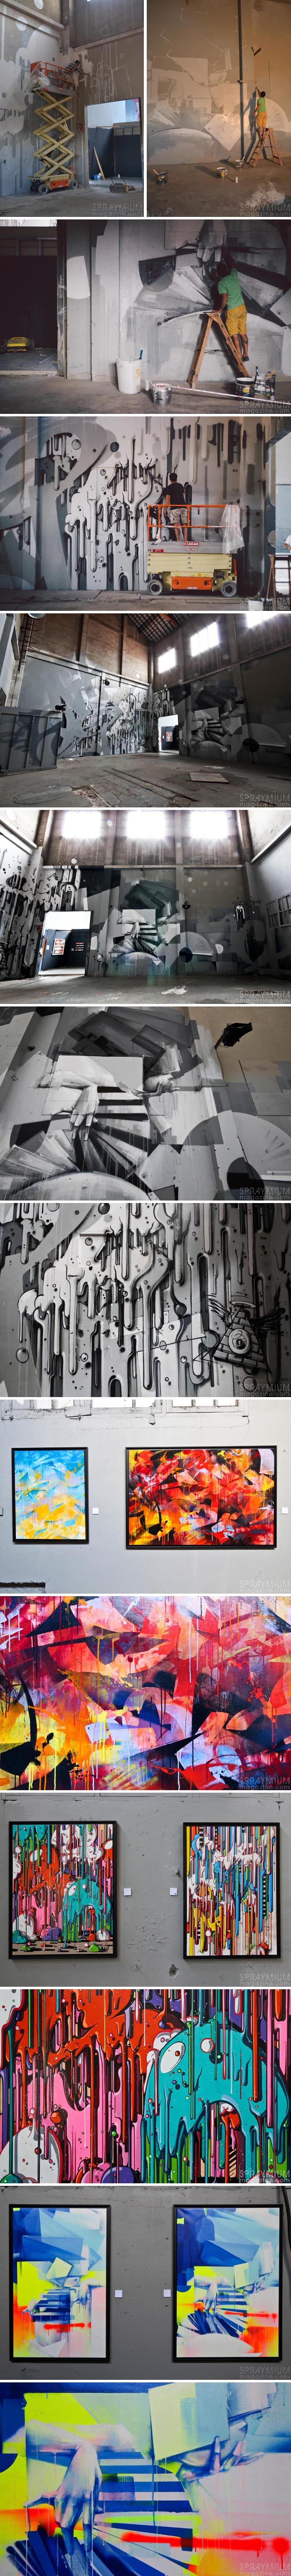 exposition mister freeze toulouse art urbain contemporain graffiti postgraffiti streetart muralism spraymium zest momies eack